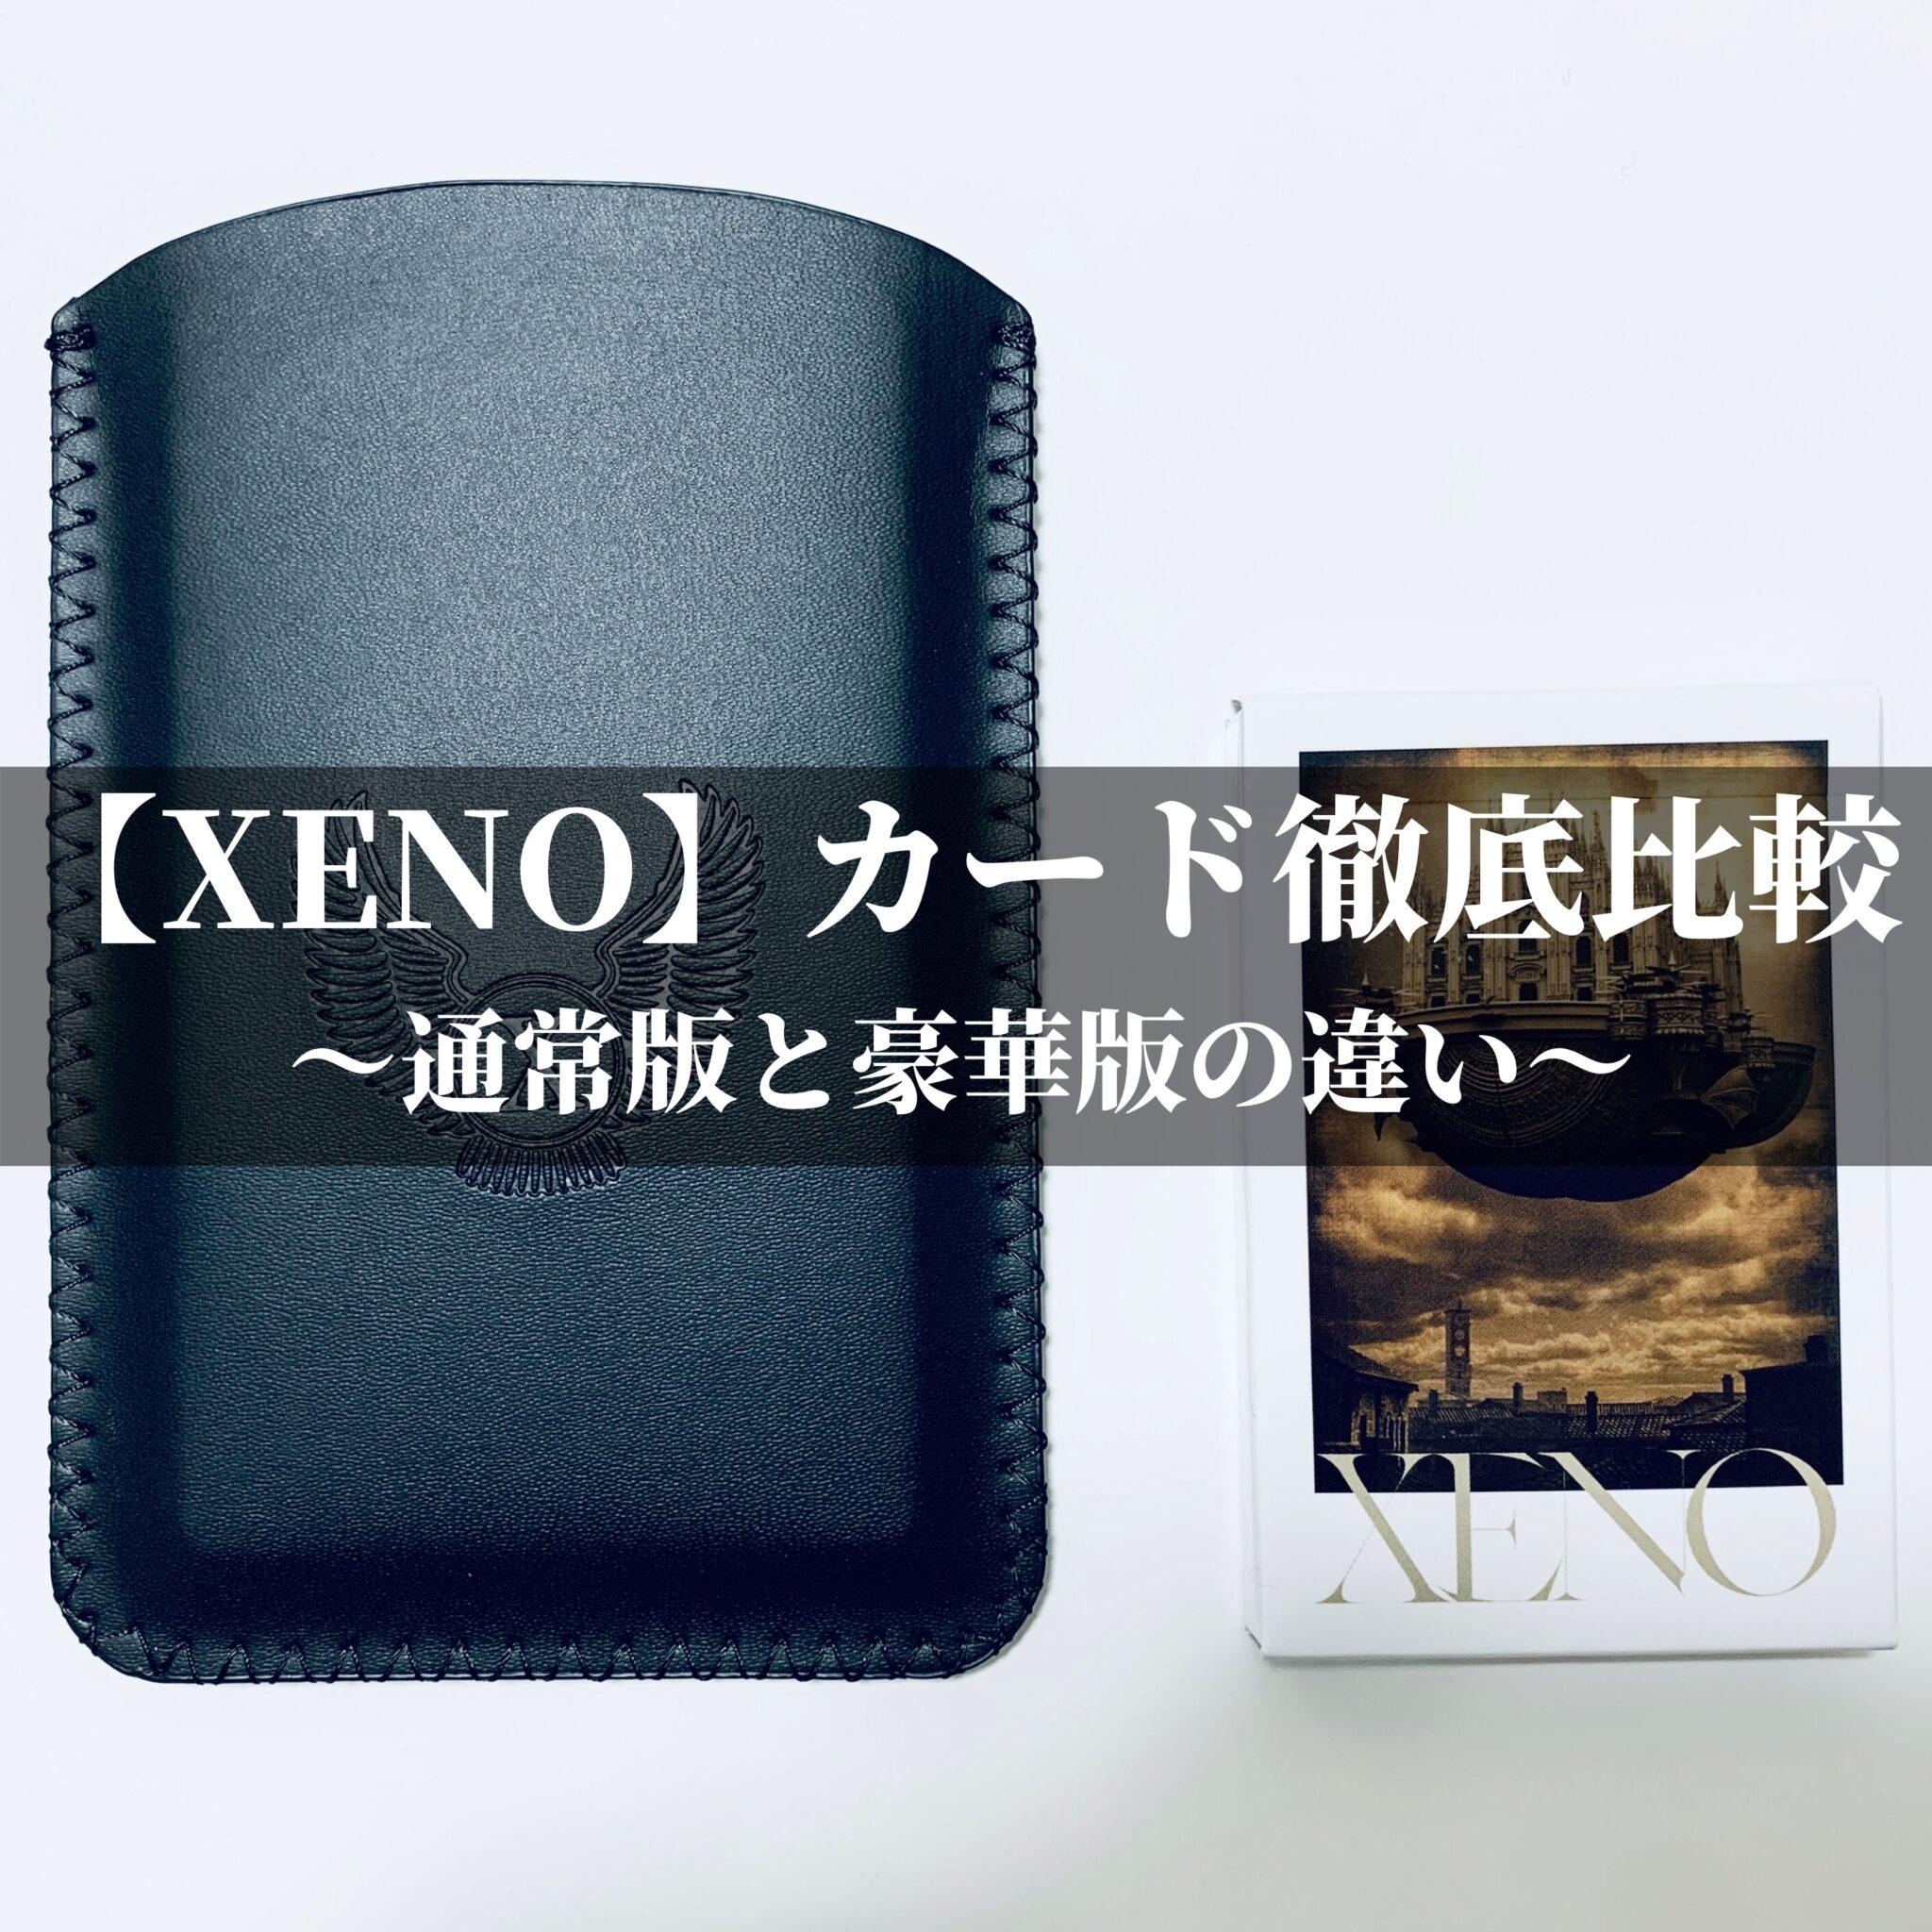 【XENO】カード徹底比較〜通常版と豪華版の違い〜